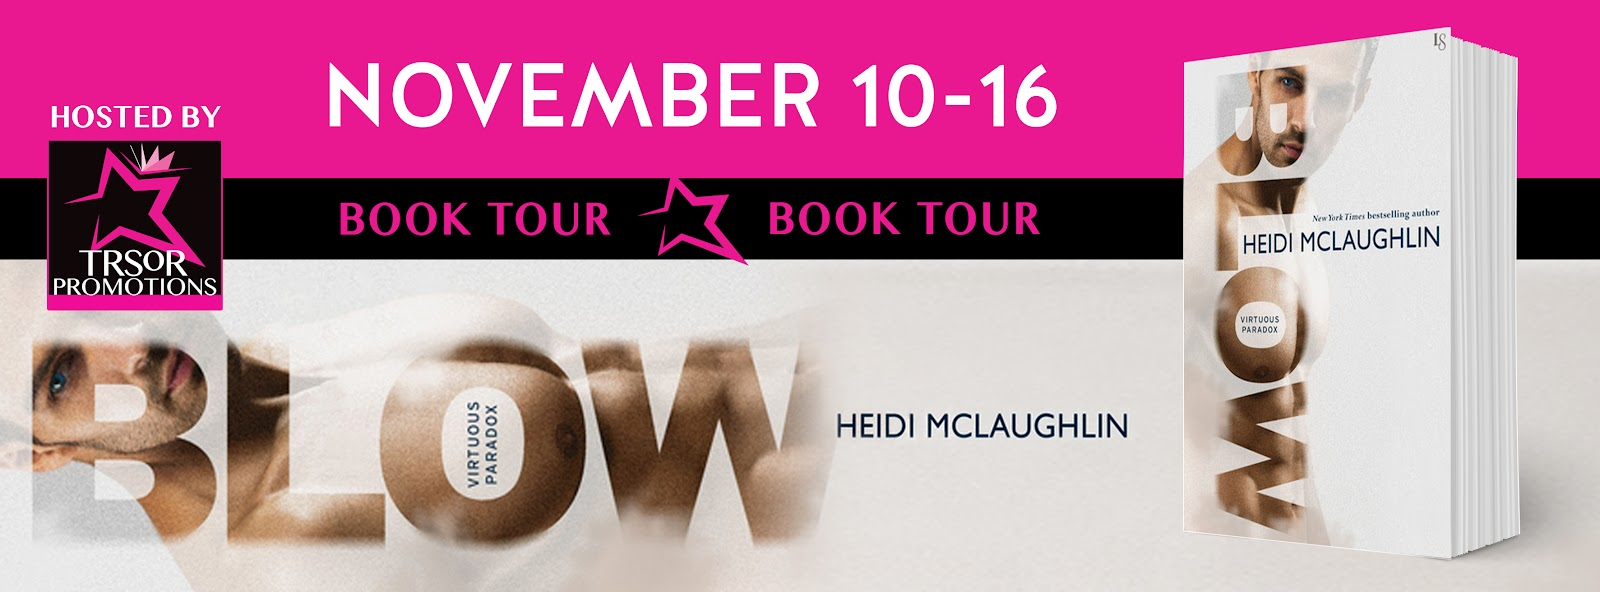 BLOW_BOOK_TOUR.jpg